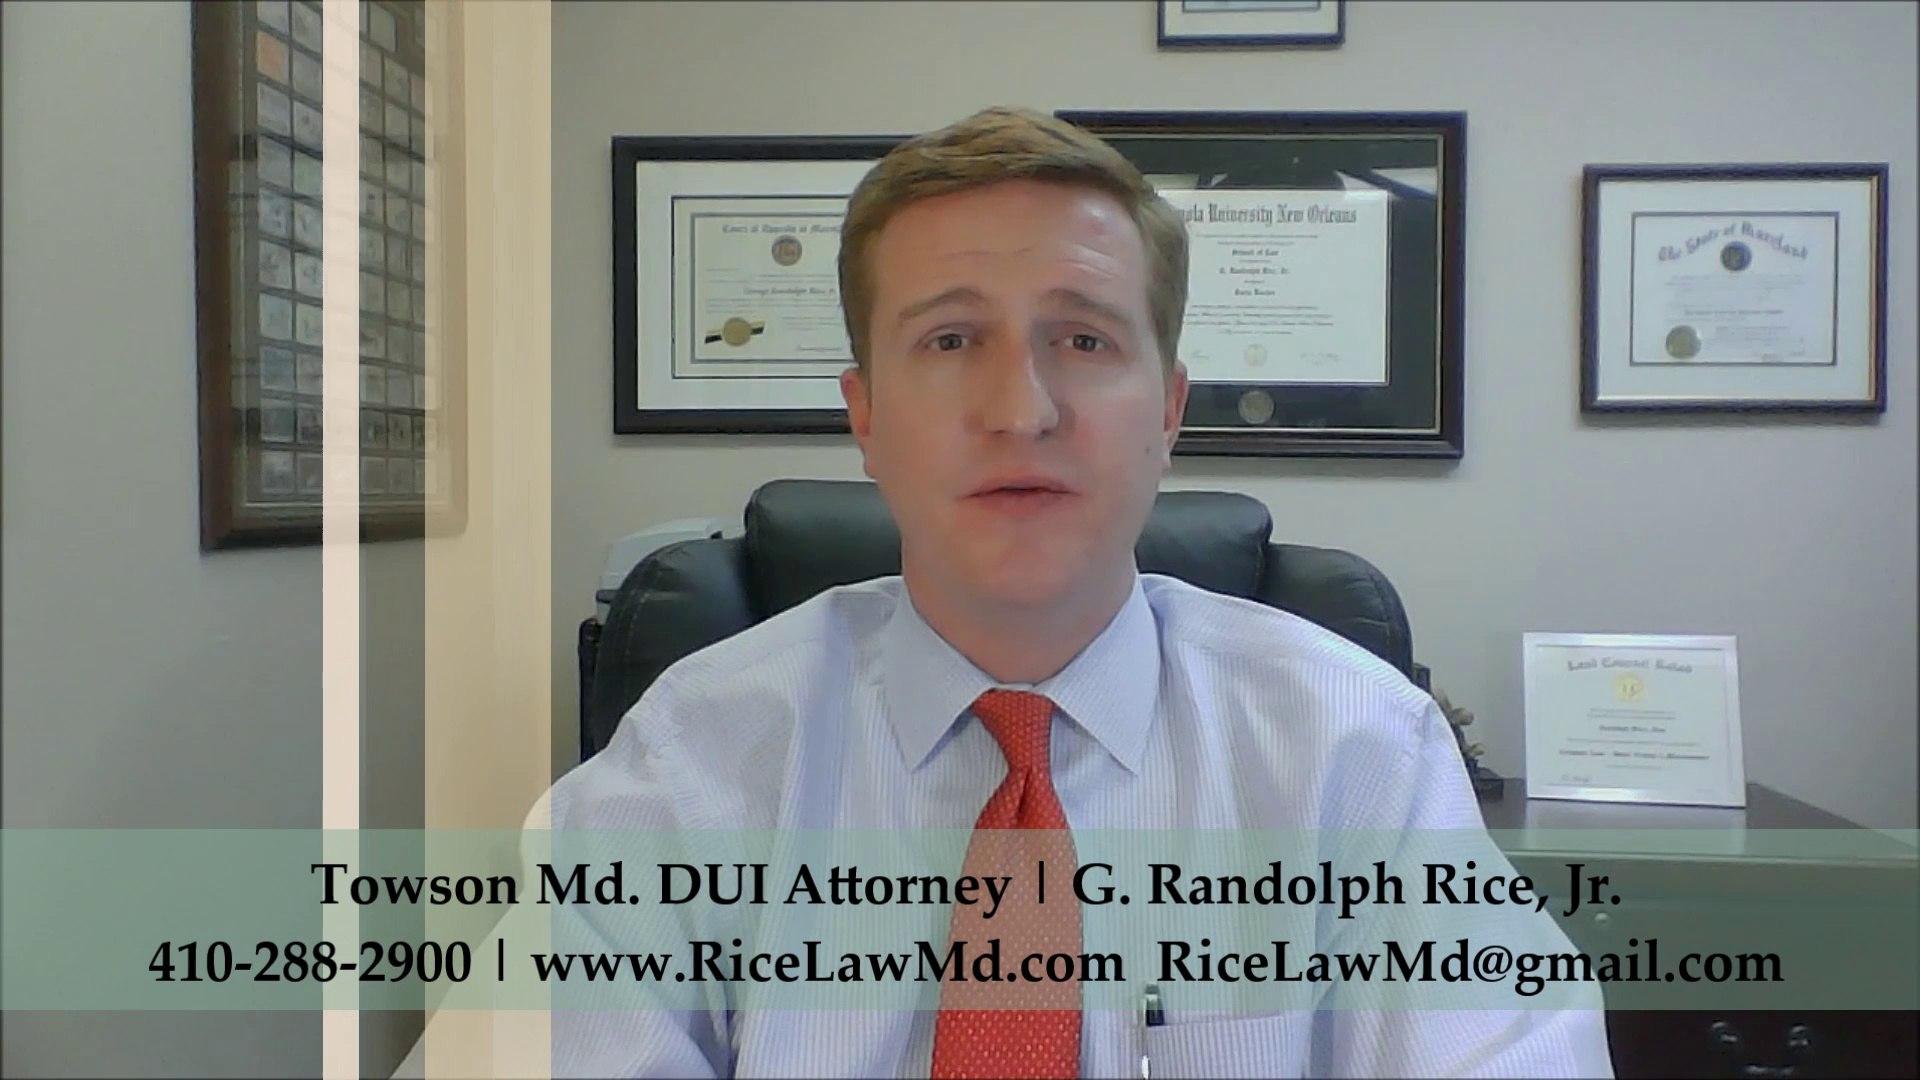 Towson Maryland DUI Lawyer G. Randolph Rice, Jr.